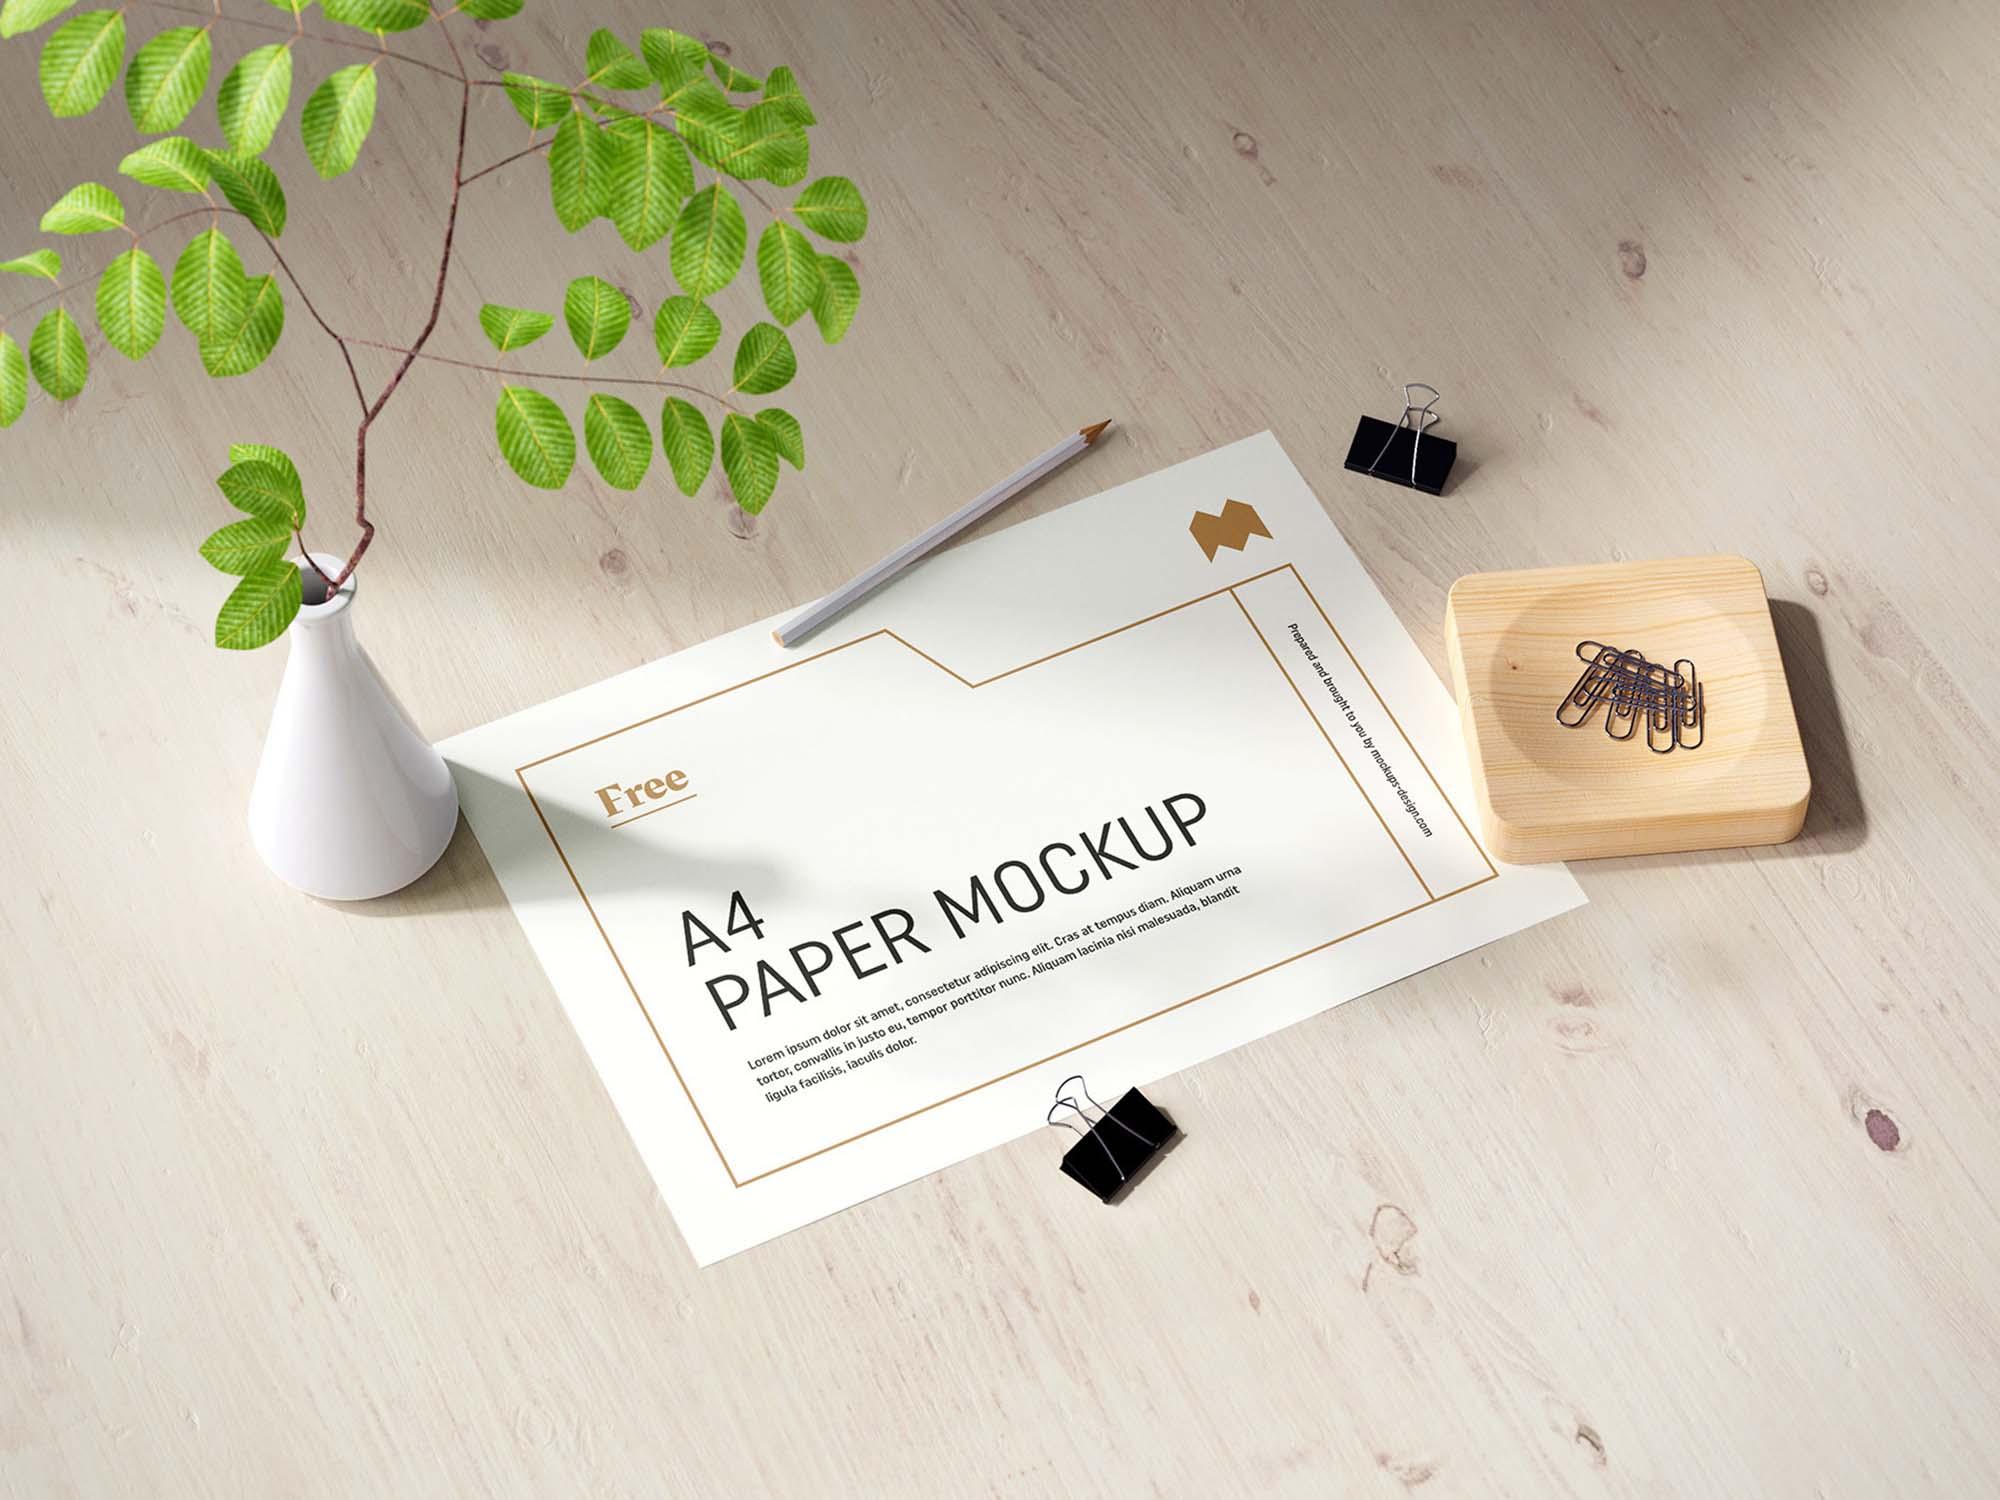 A4 Paper Mockup 2